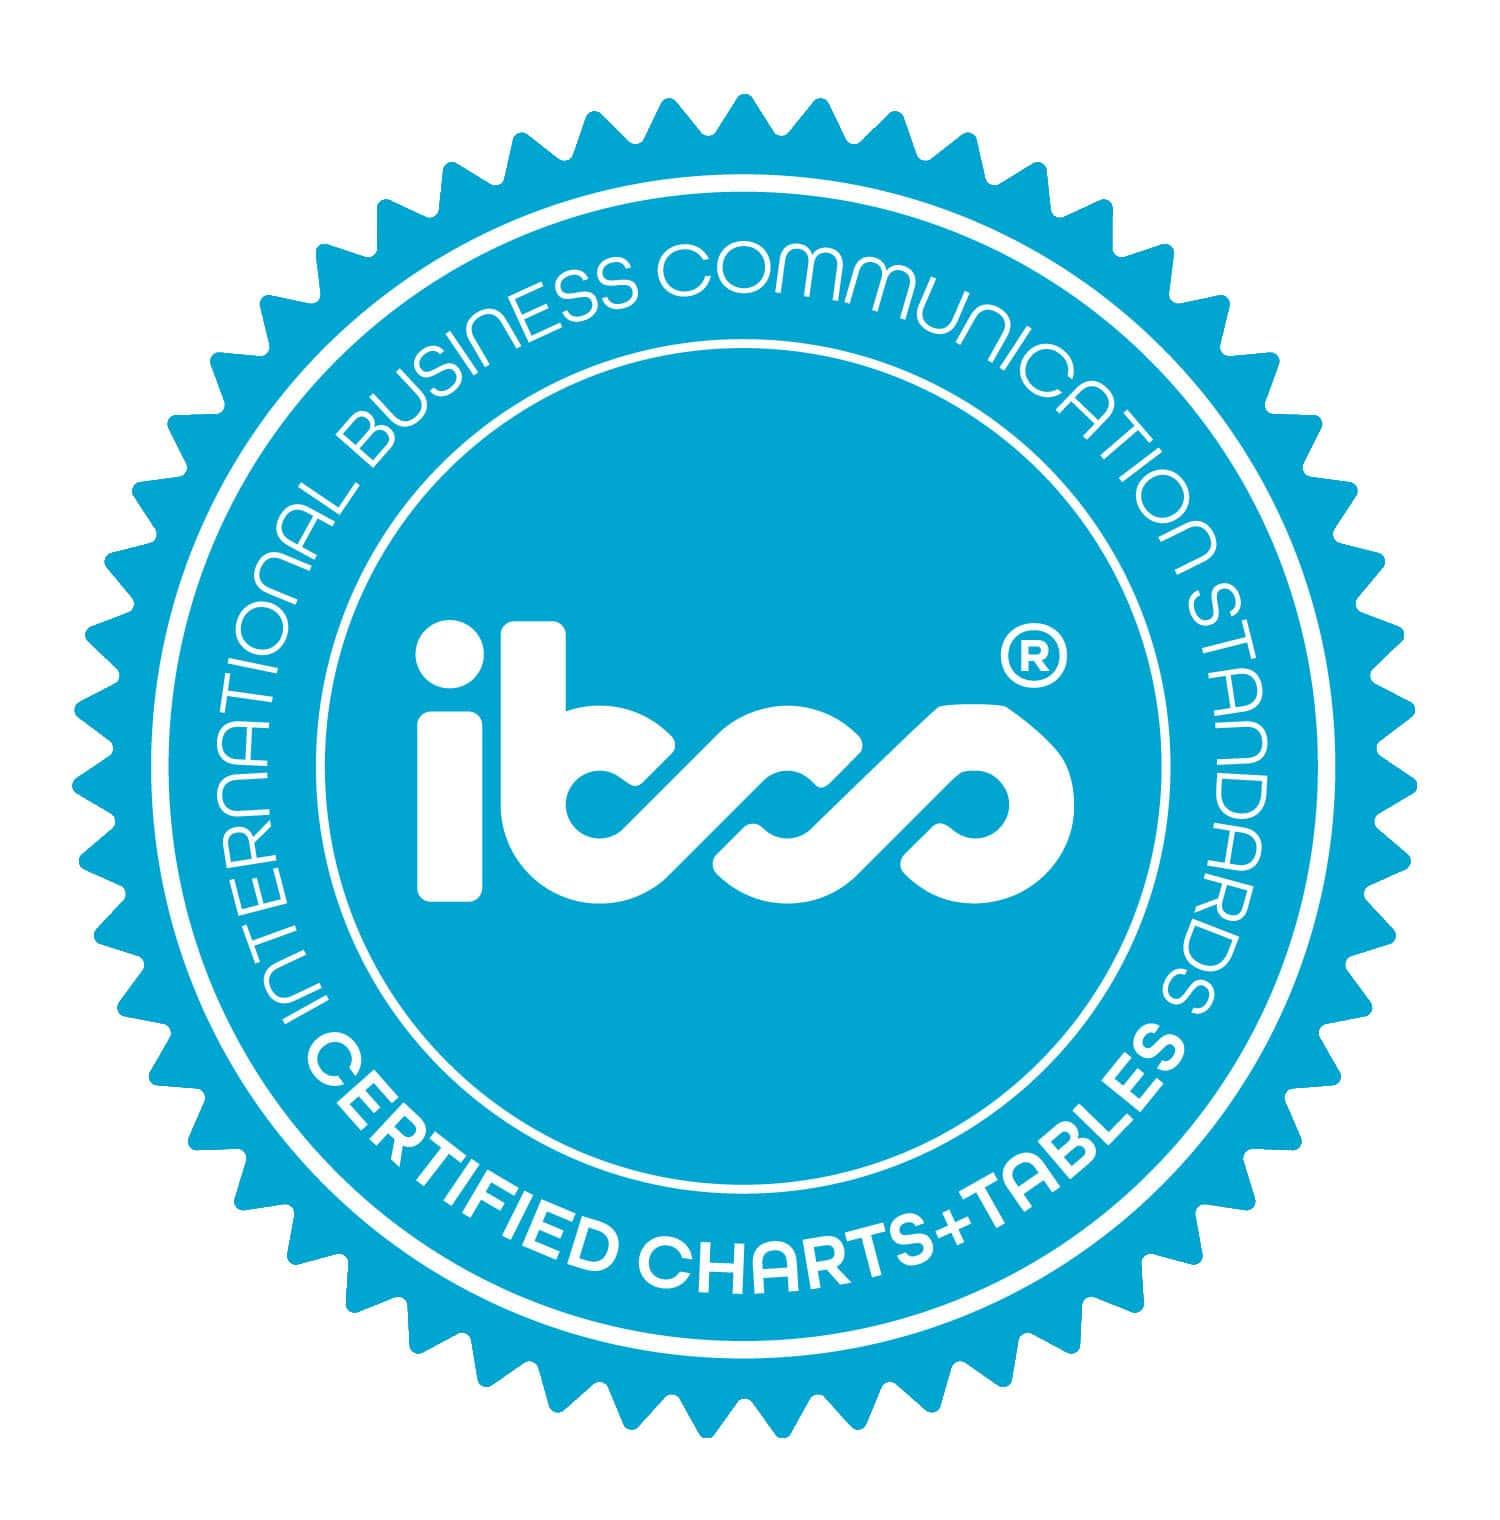 IBCS certificate for Zebra BI custom visuals for Power BI.